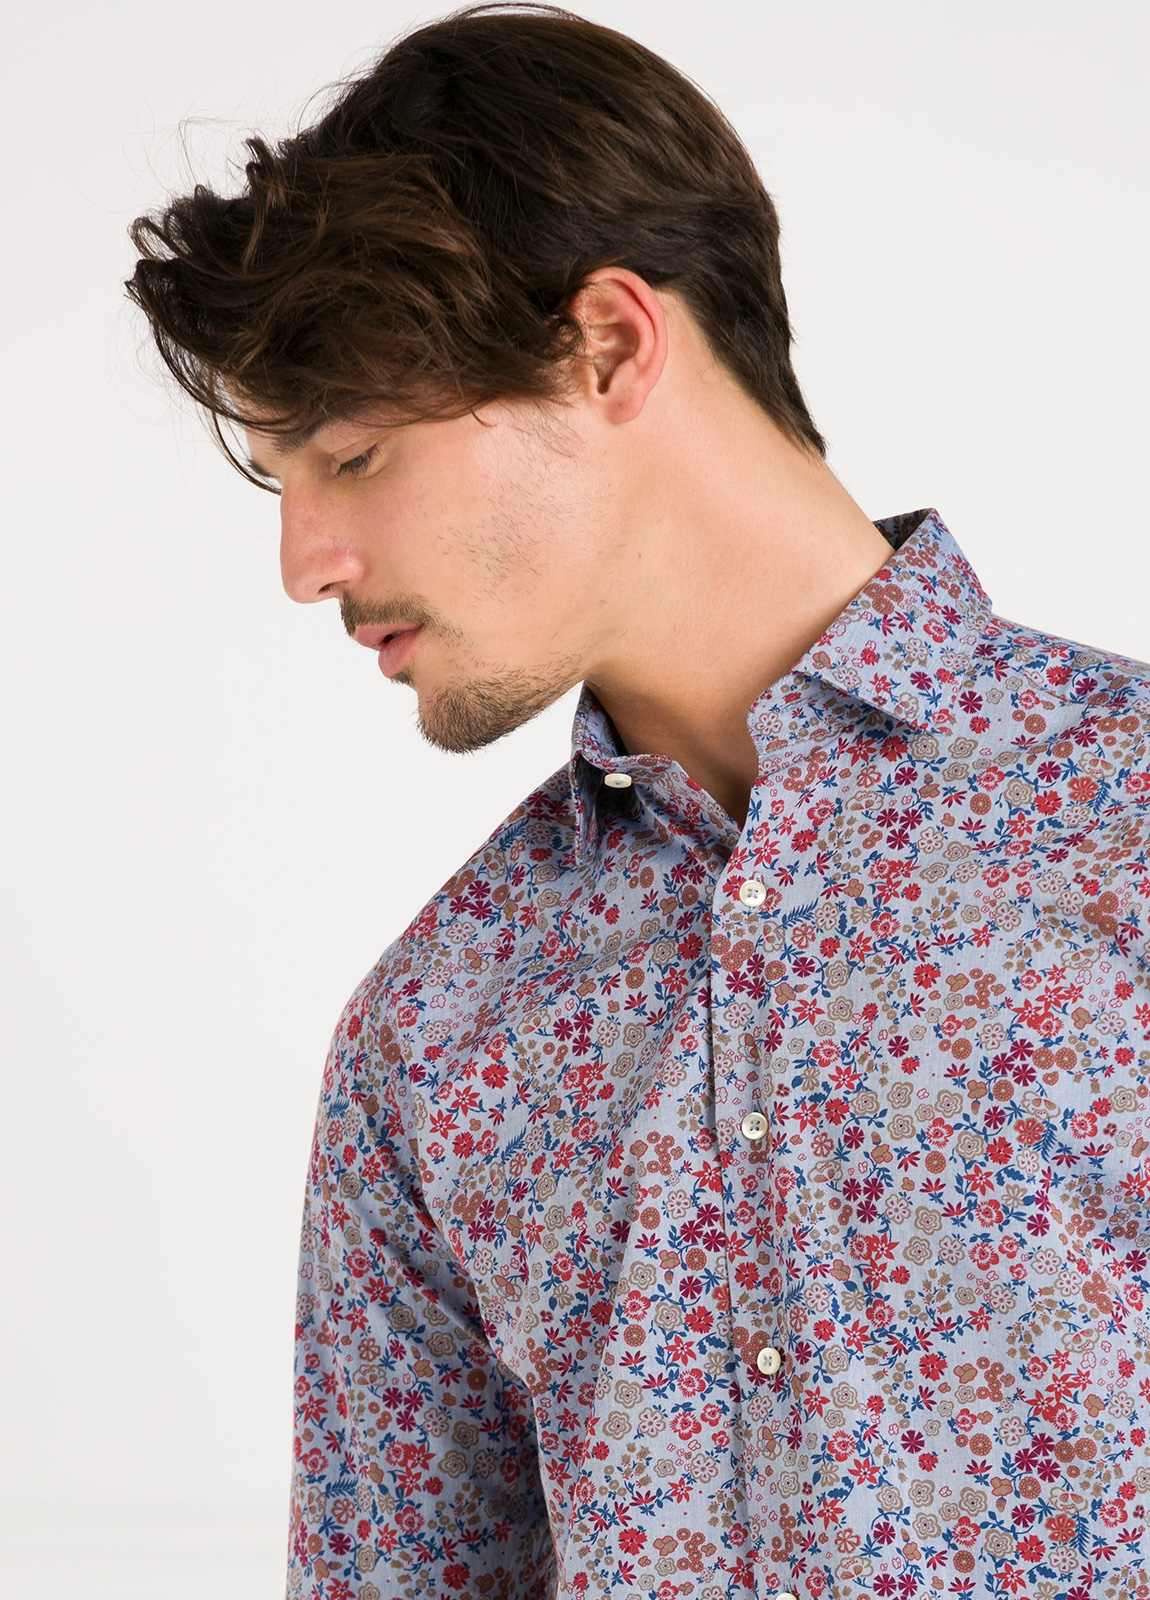 Camisa Leisure Wear SLIM FIT modelo PORTO dibujo floral fondo blanco. 100% Algodón. - Ítem1